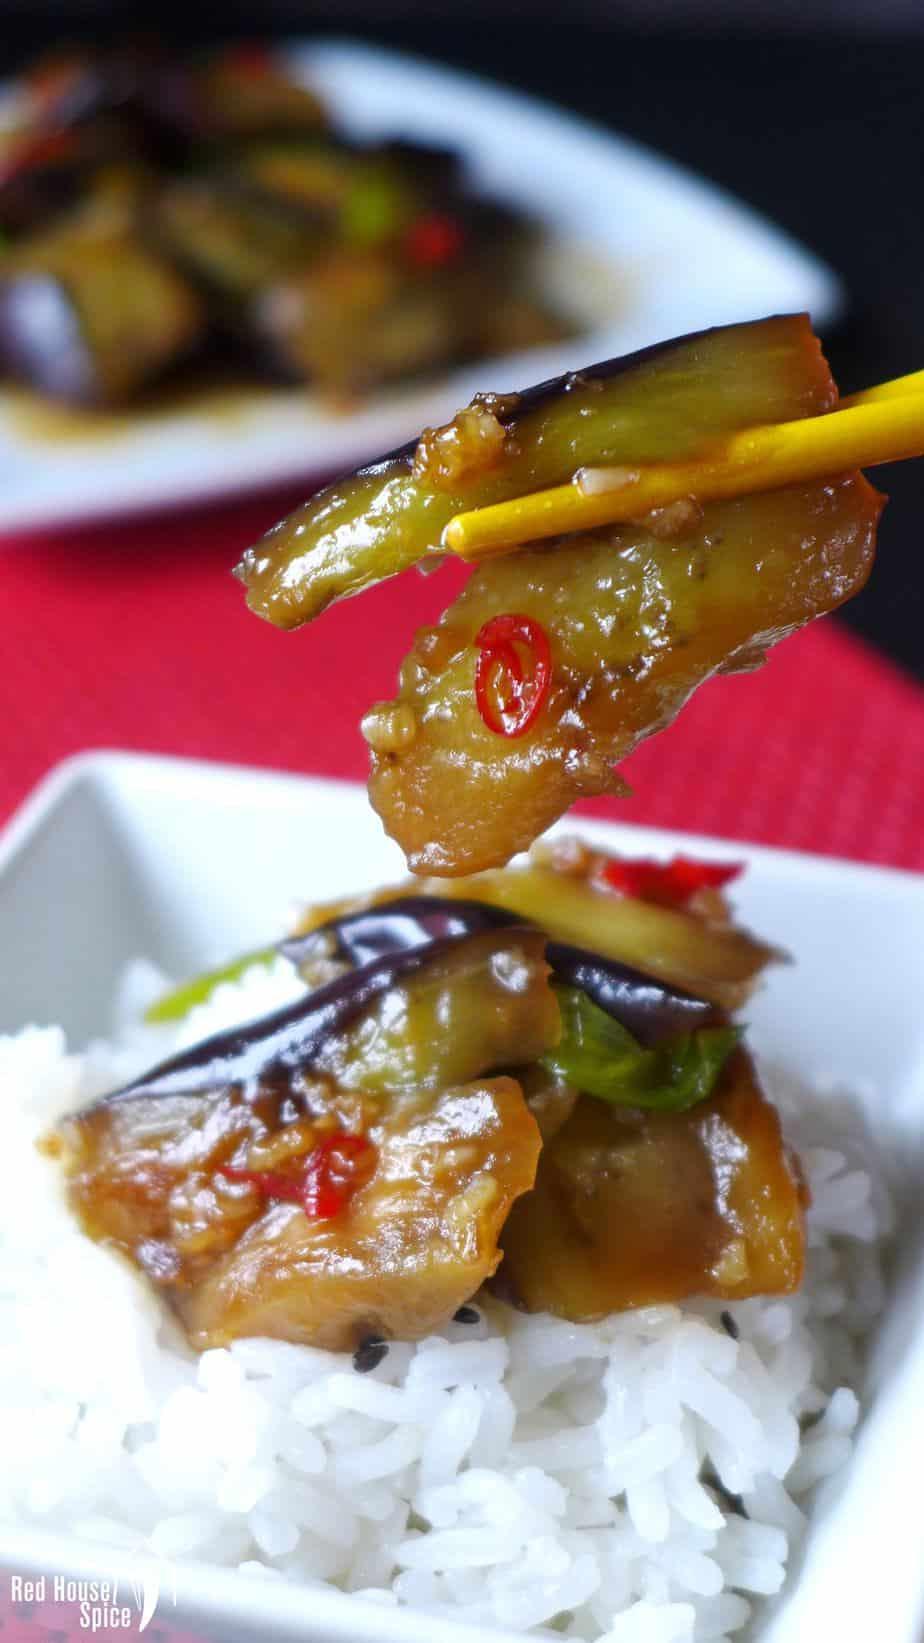 stir-fried eggplant over rice